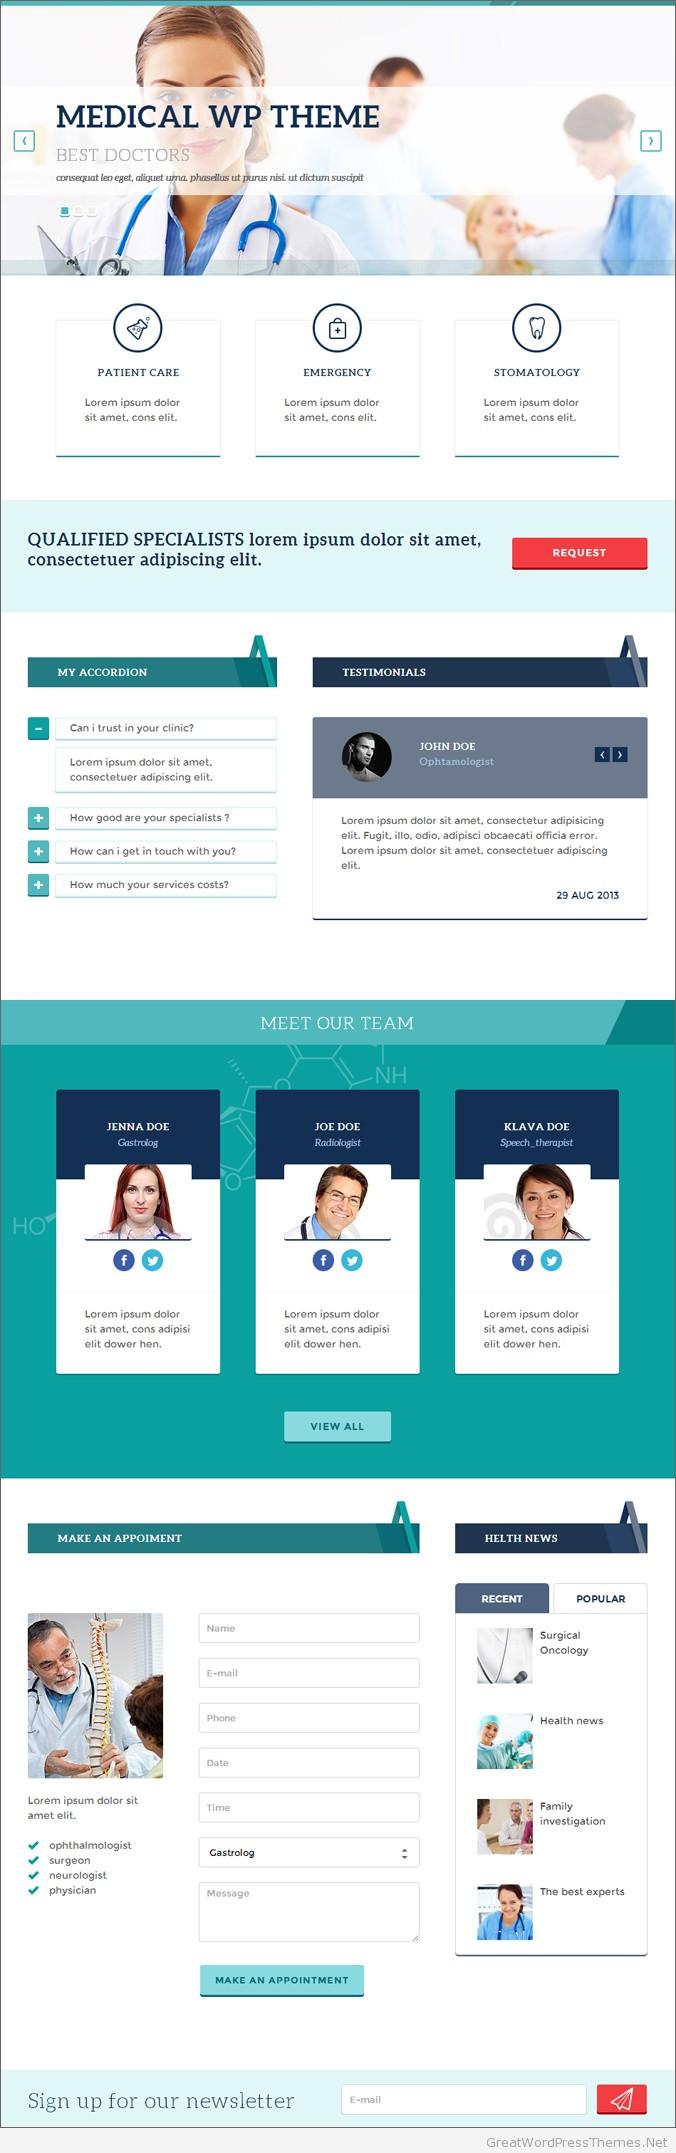 MedPark-WordPress-Theme